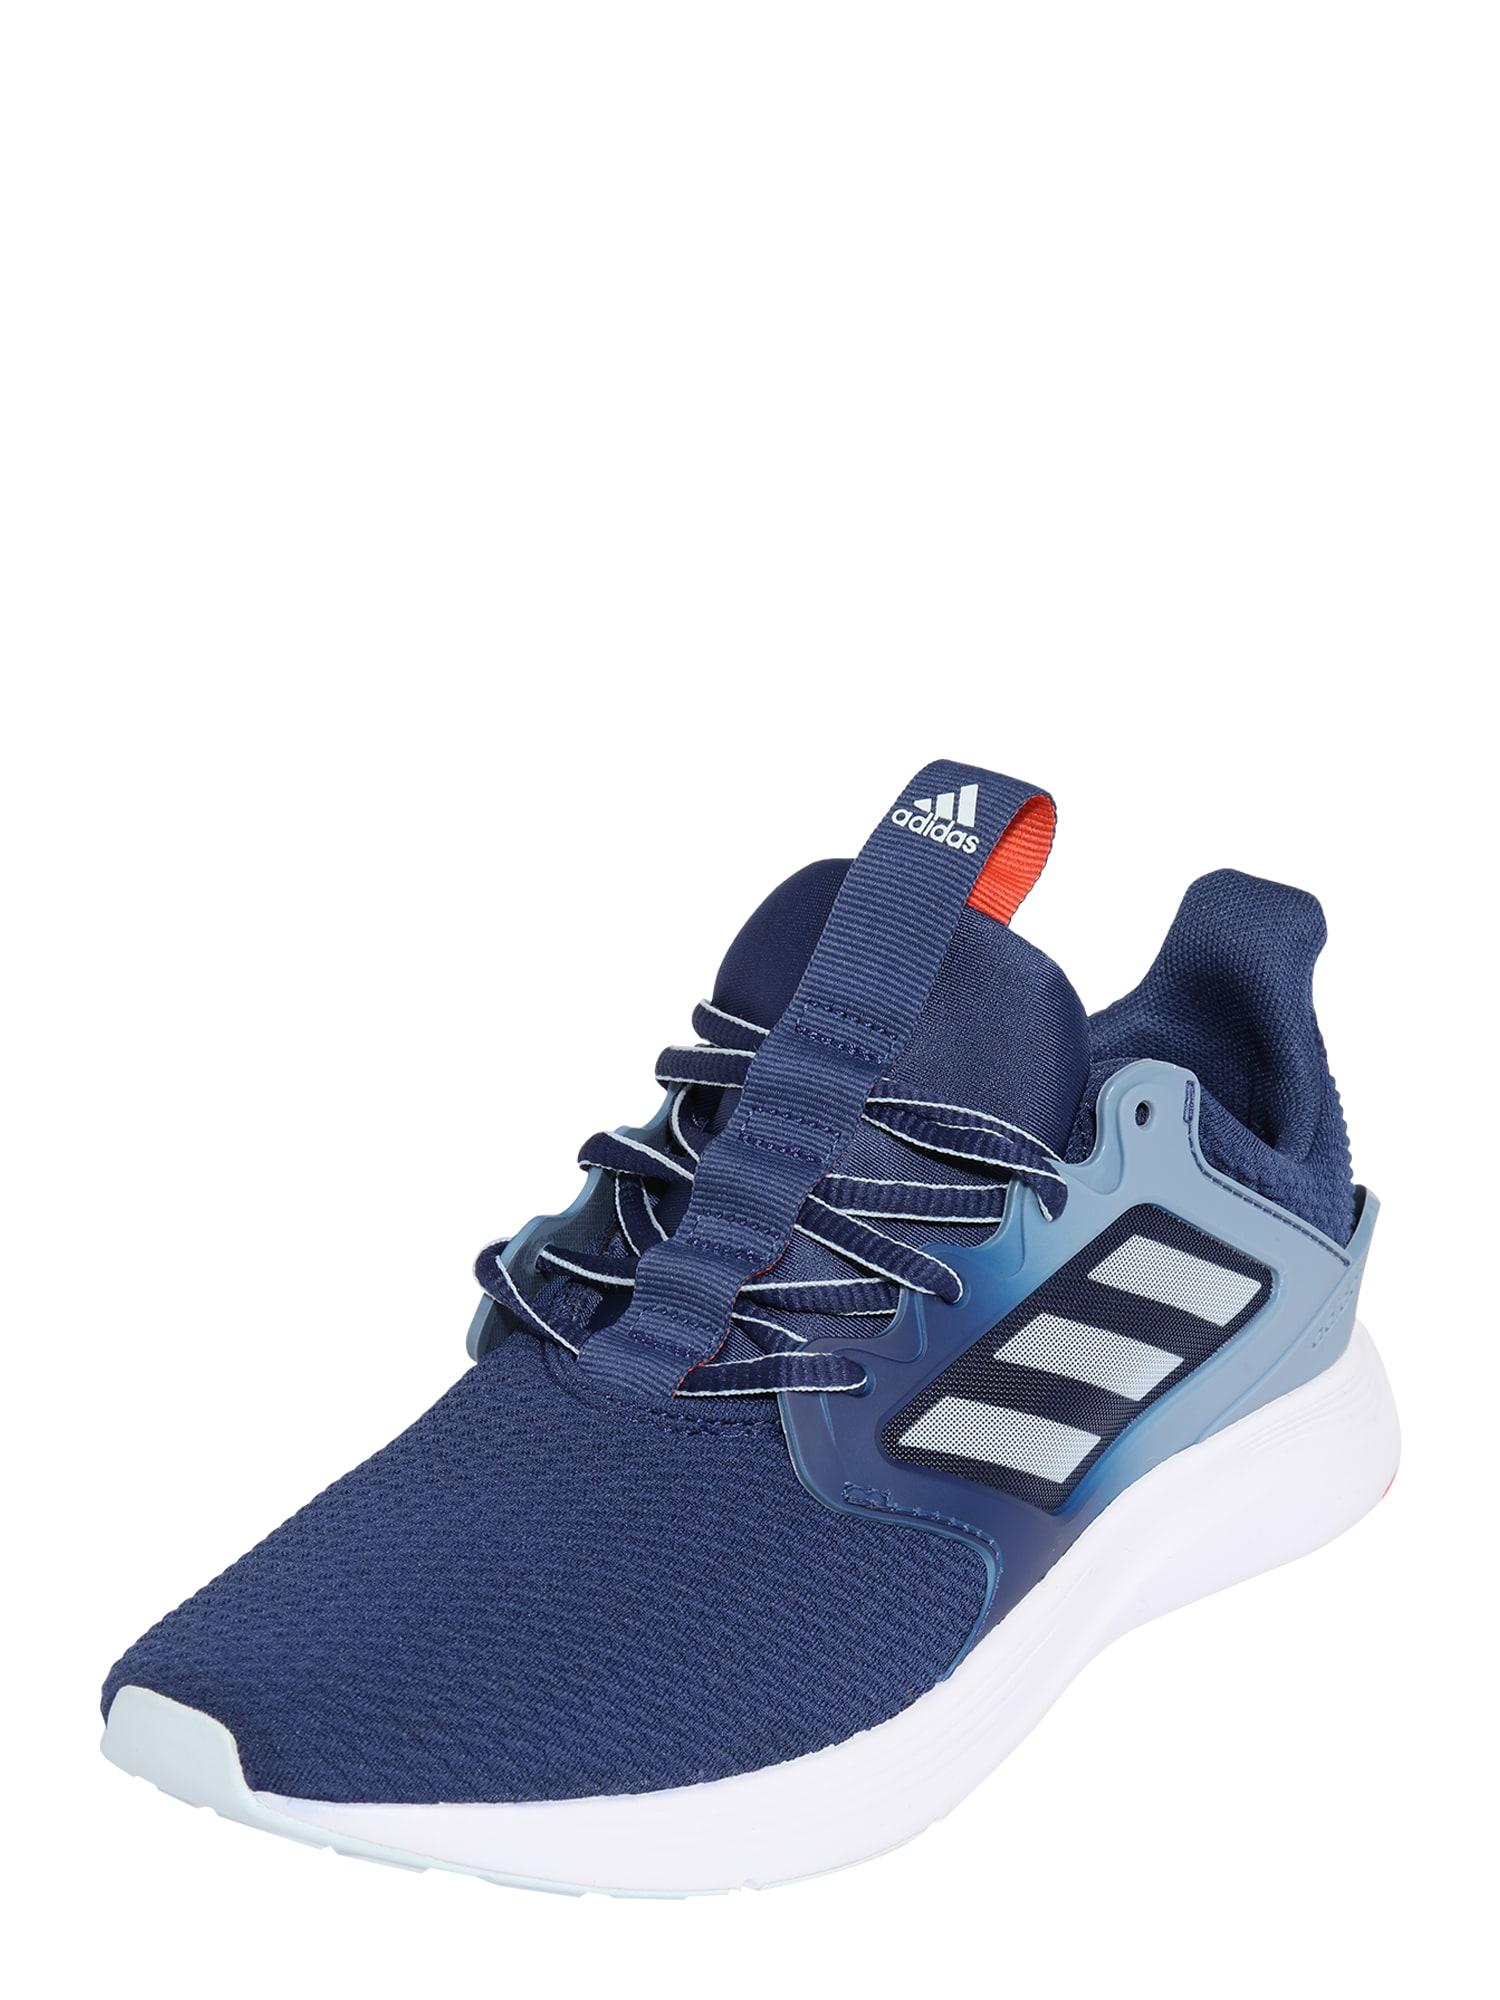 ADIDAS PERFORMANCE Běžecká obuv 'Energy Falcon'  tmavě modrá